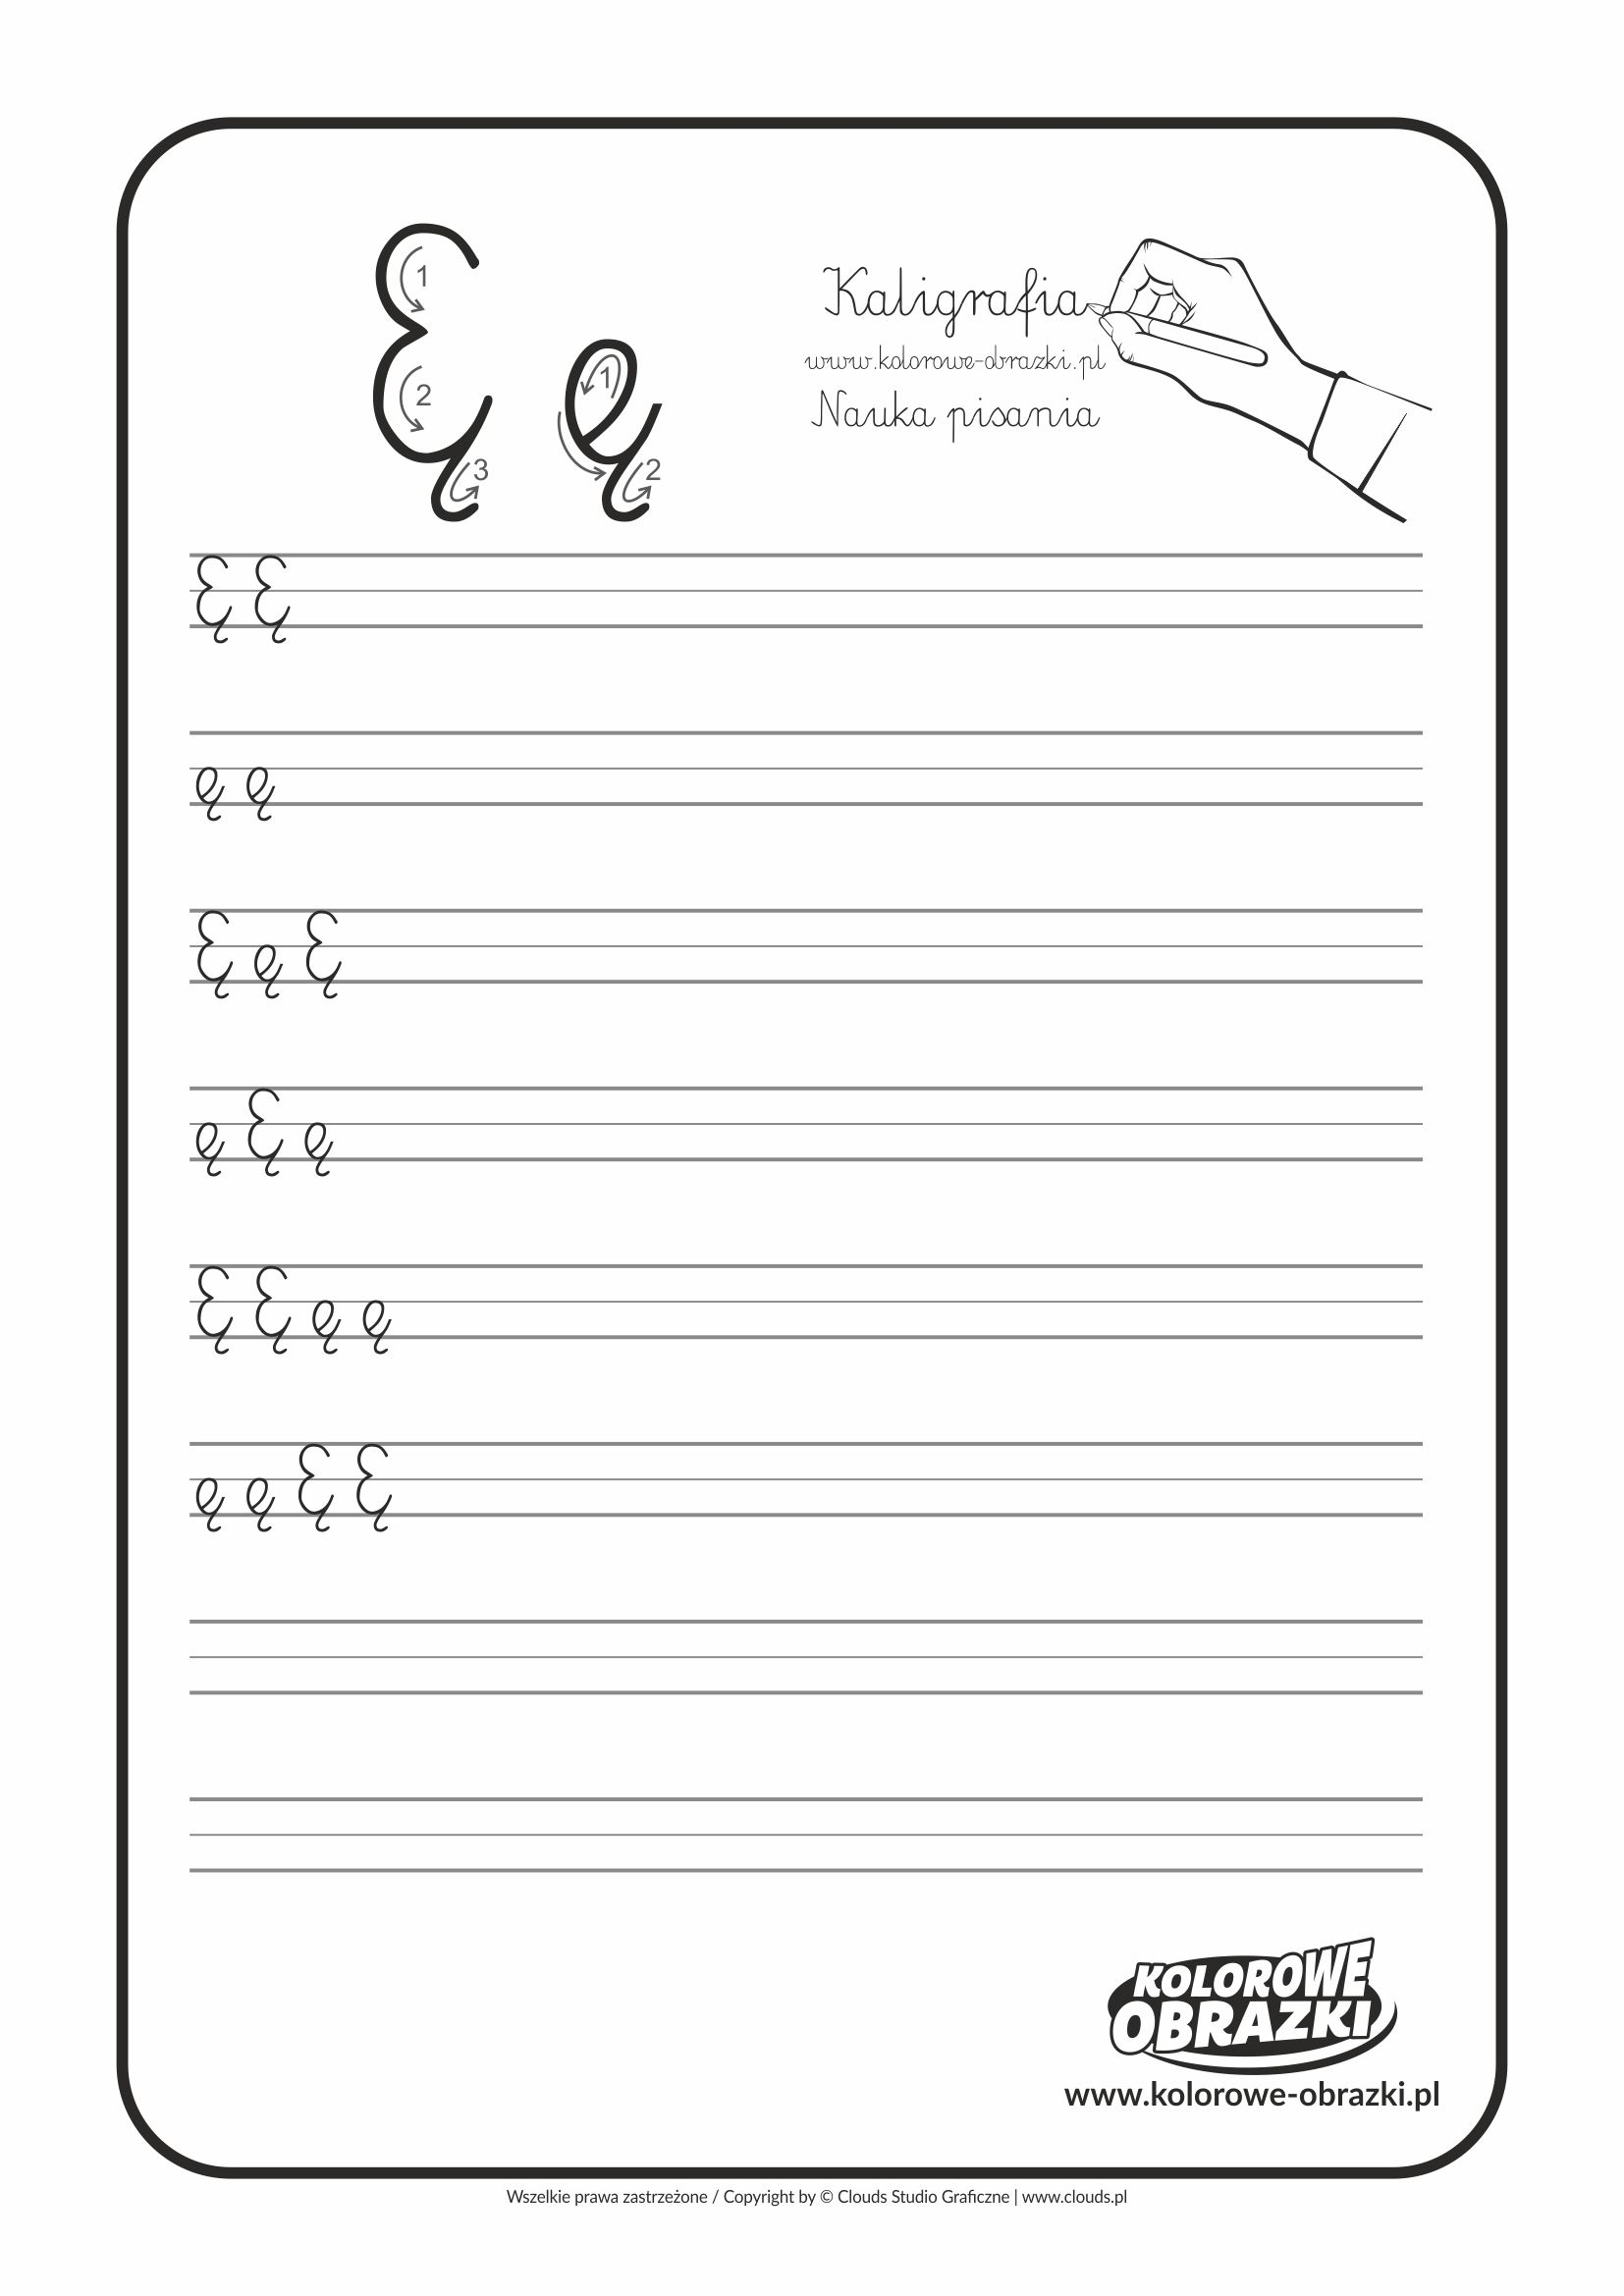 Kaligrafia Dla Dzieci Cwiczenia Kaligraficzne Litera E Nauka Pisania Litery E Letters For Kids Calligraphy For Kids Cool Coloring Pages